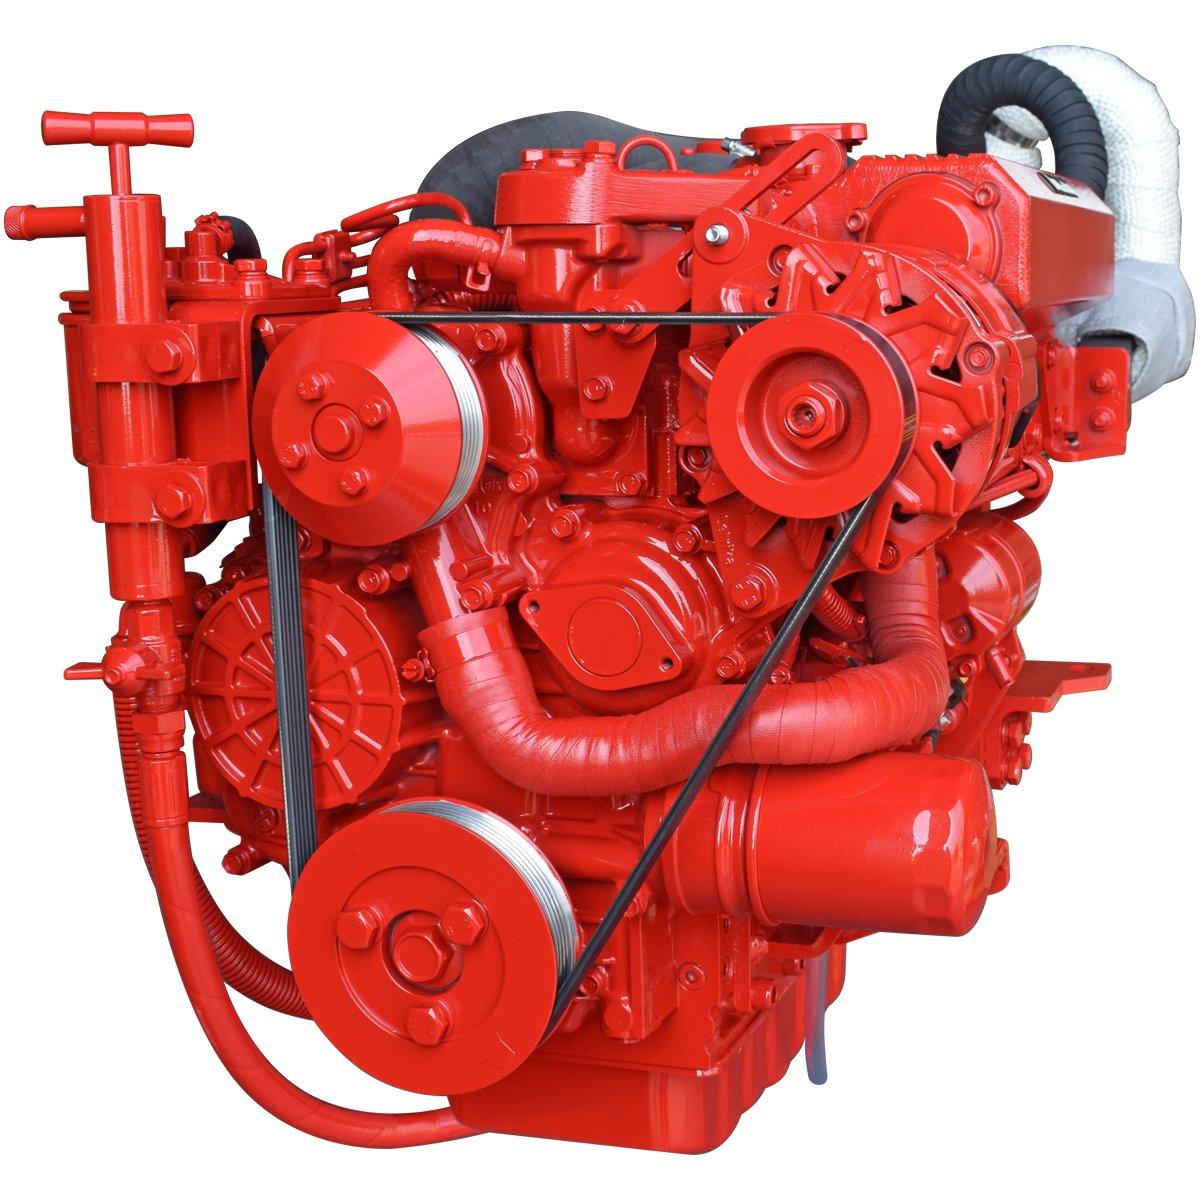 Beta Marine USA - marine diesel saildrive engines - Beta 45TSD heat exchanger saildrive engine